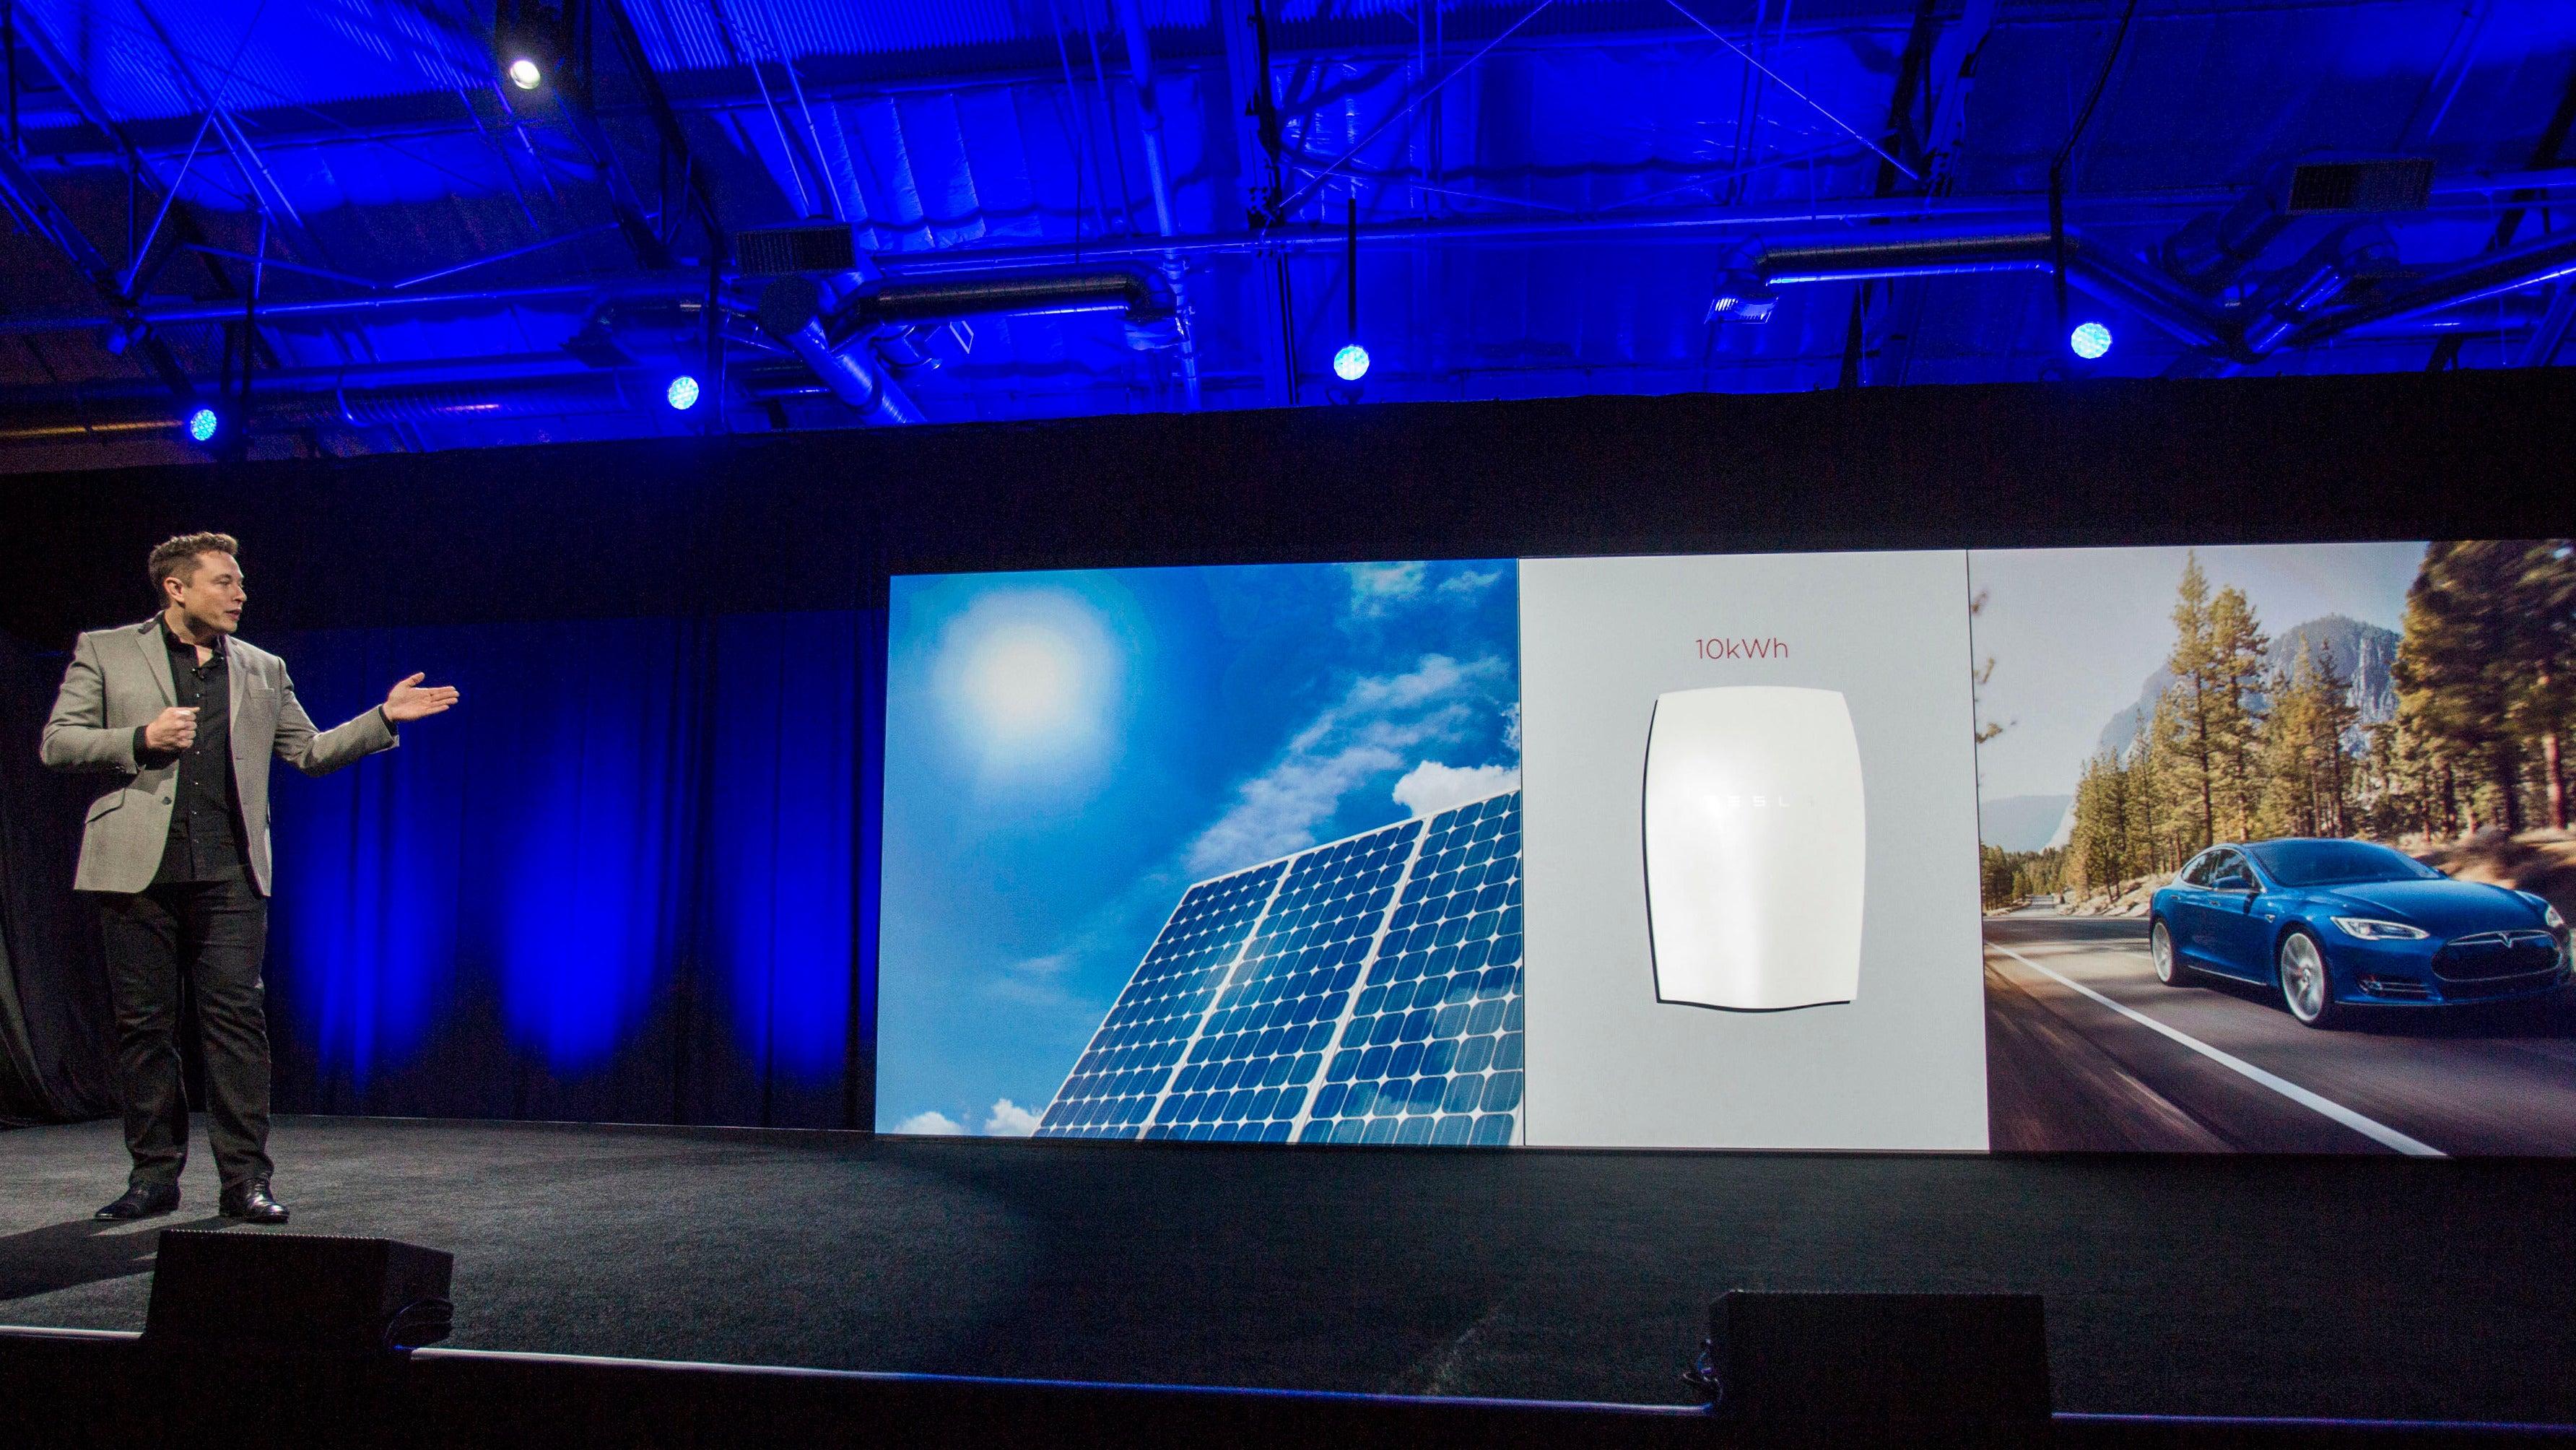 Tesla's Solar Factory Is Reportedly Struggling To Meet Elon Musk's 'Aesthetic Demands'